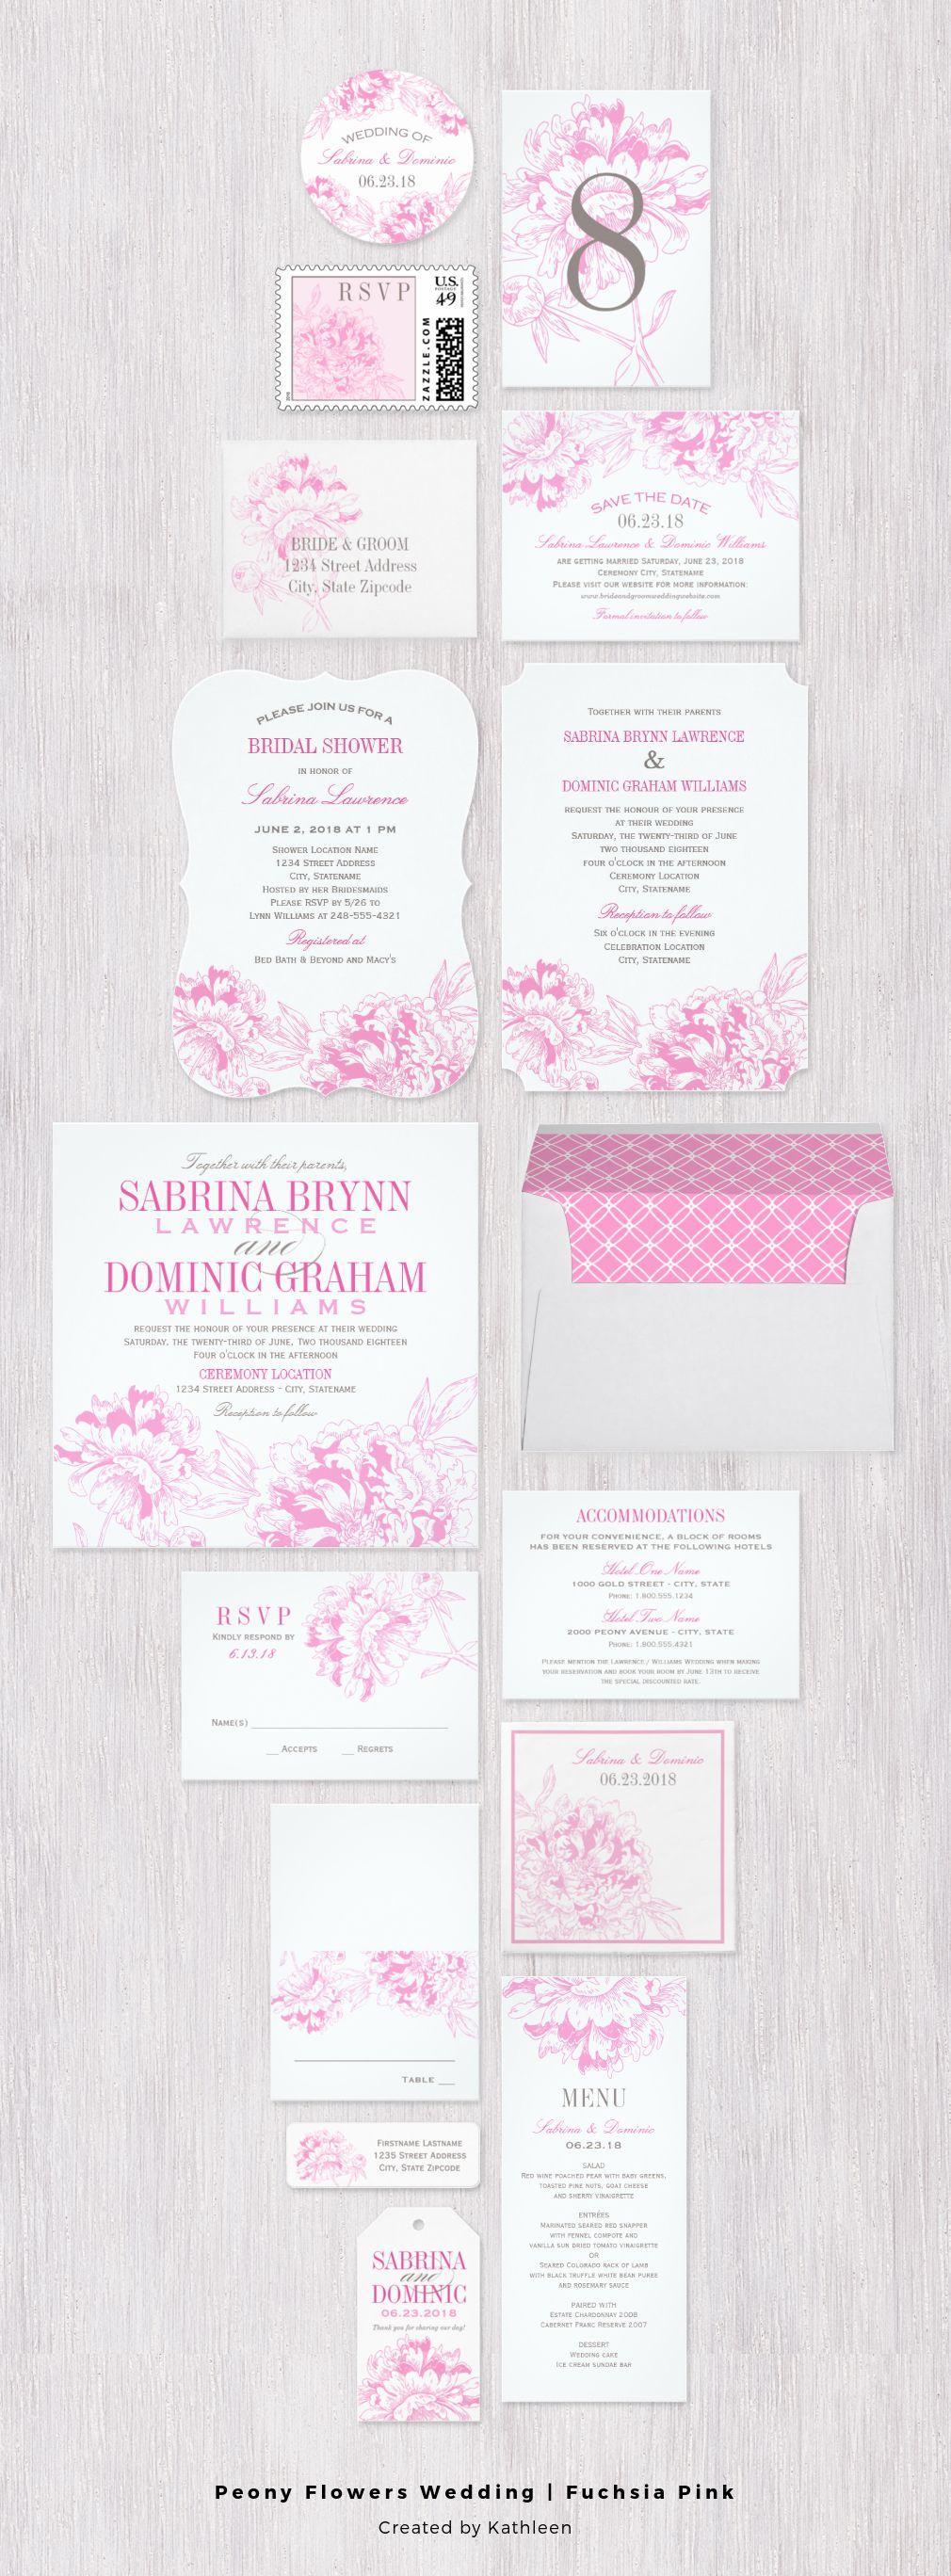 romantic peony wedding invitation in fuchsia pink and gray